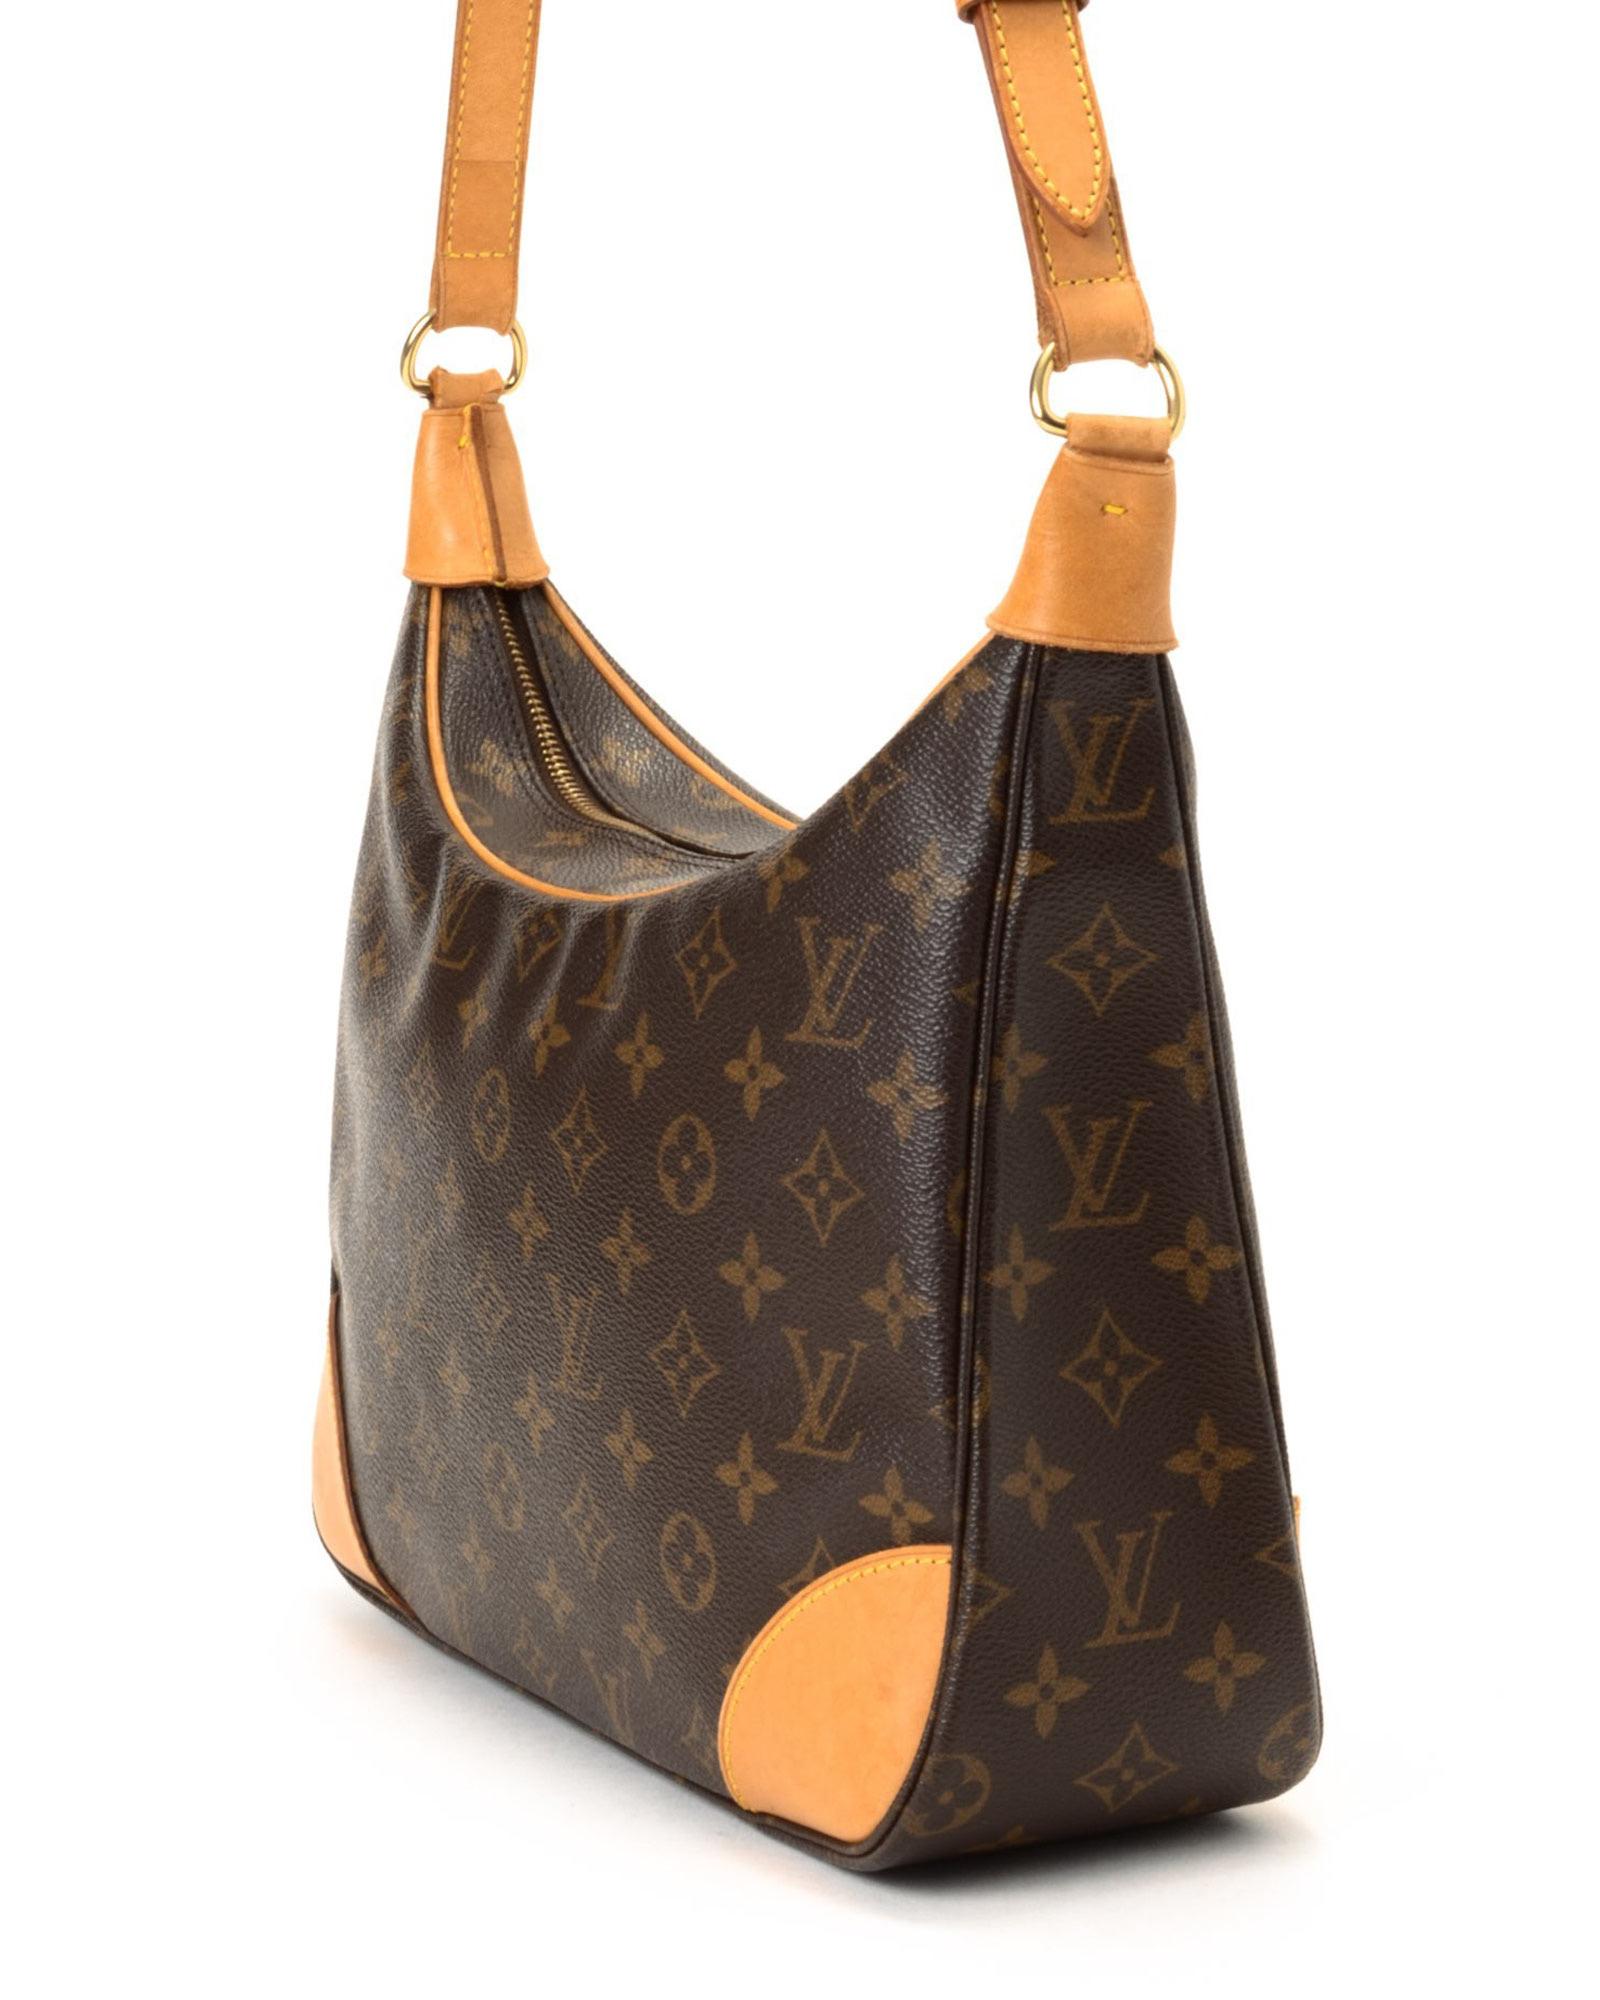 cbbb6bb4ab71 Authentic Louis Vuitton Monogram Musette Tango Long Strap M51388 Favorite  Straps Both Favoritefronback Louis Vuitton Musette Salsa Shoulder Bag ...